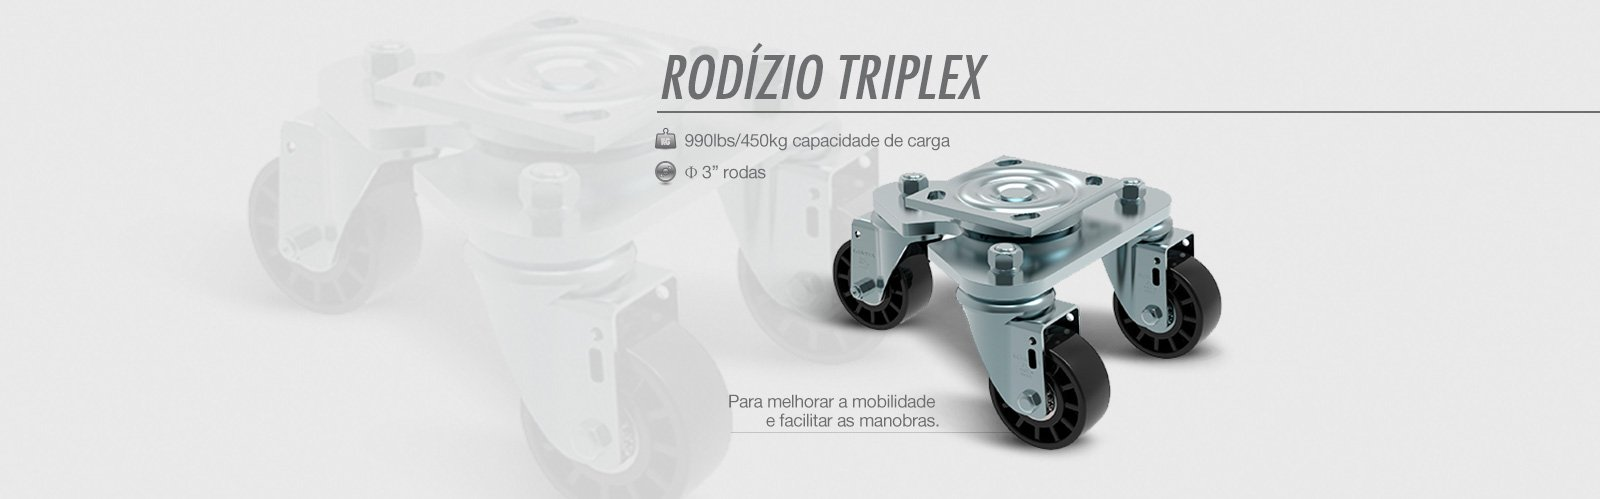 Rodízio Triplex